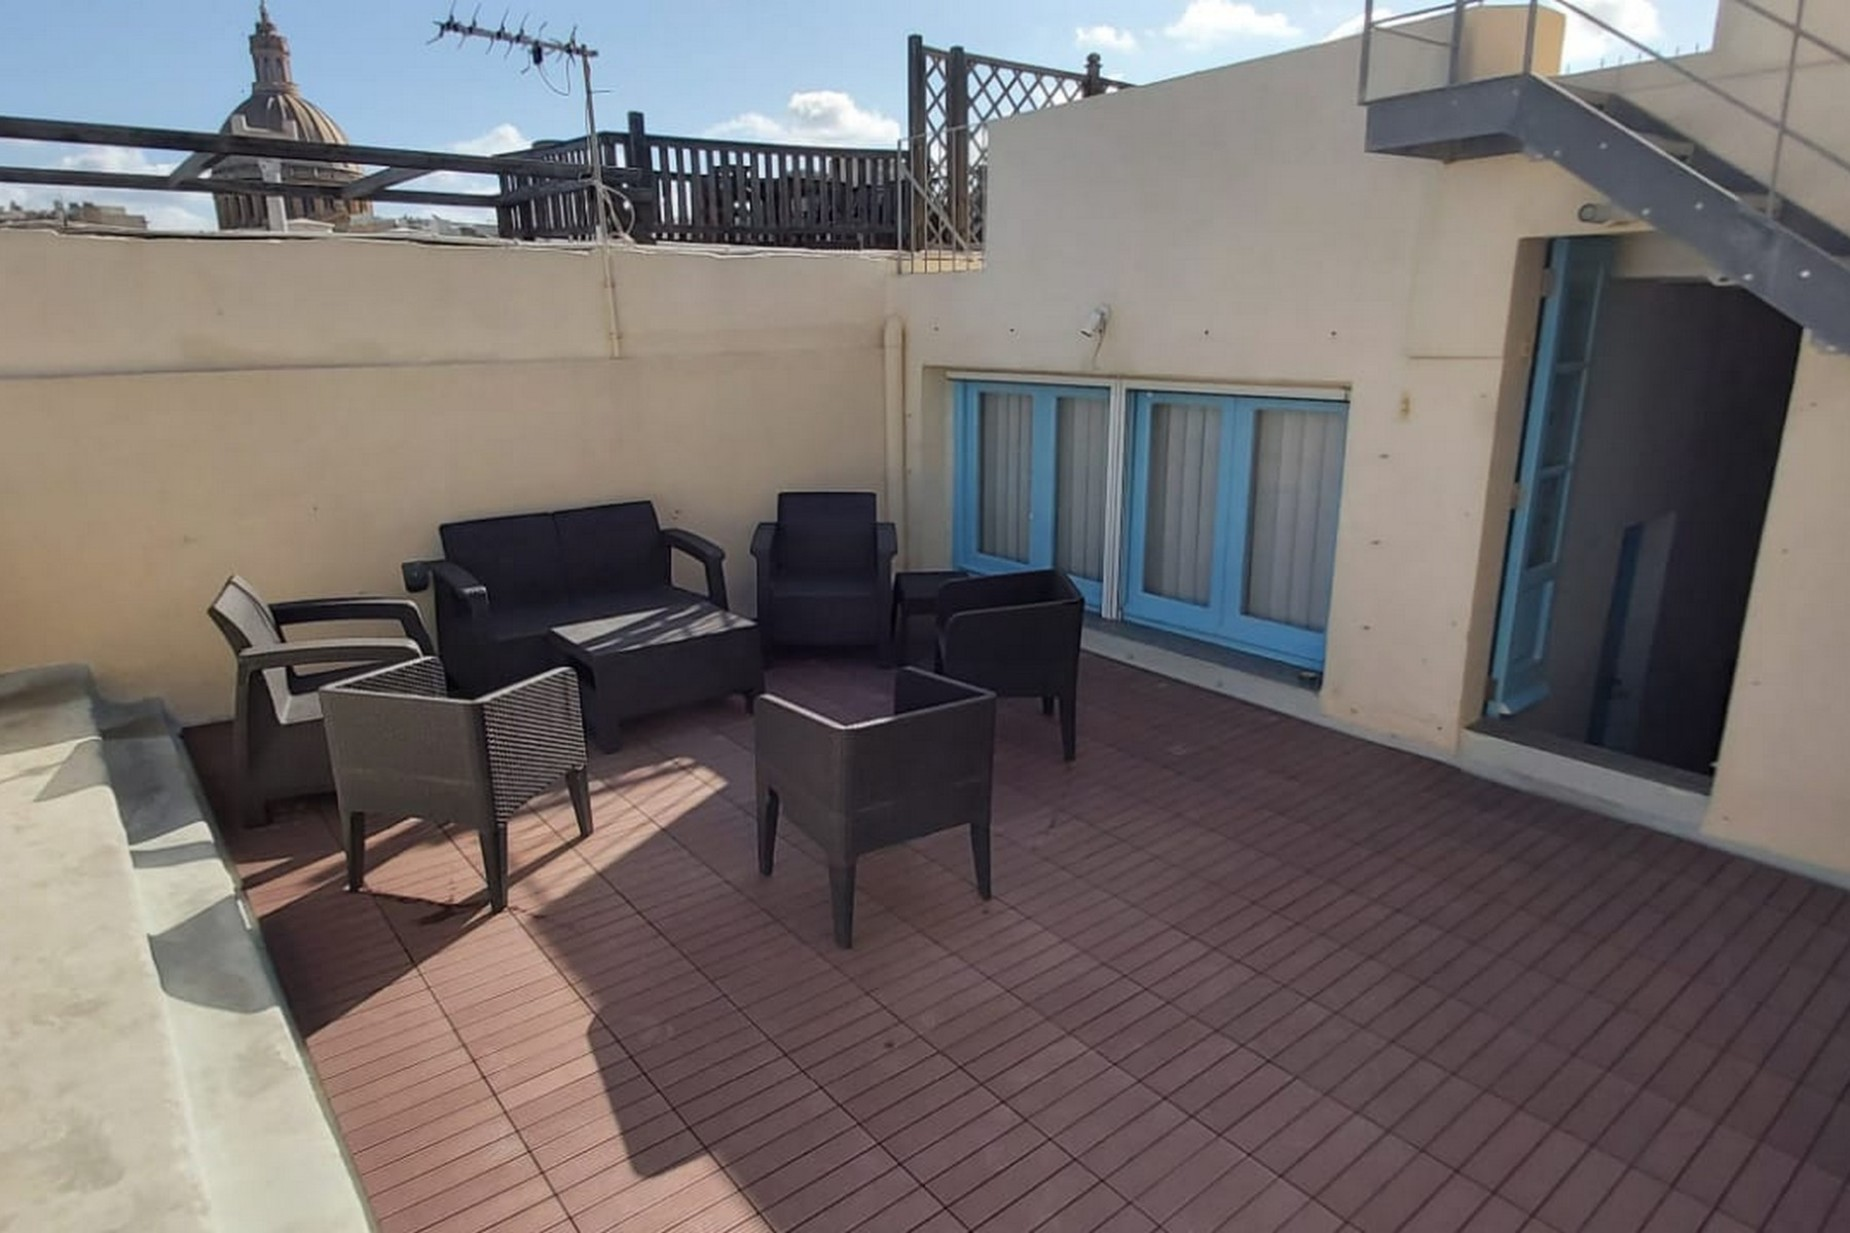 4 bed  For Sale in Valletta, Valletta - thumb 10